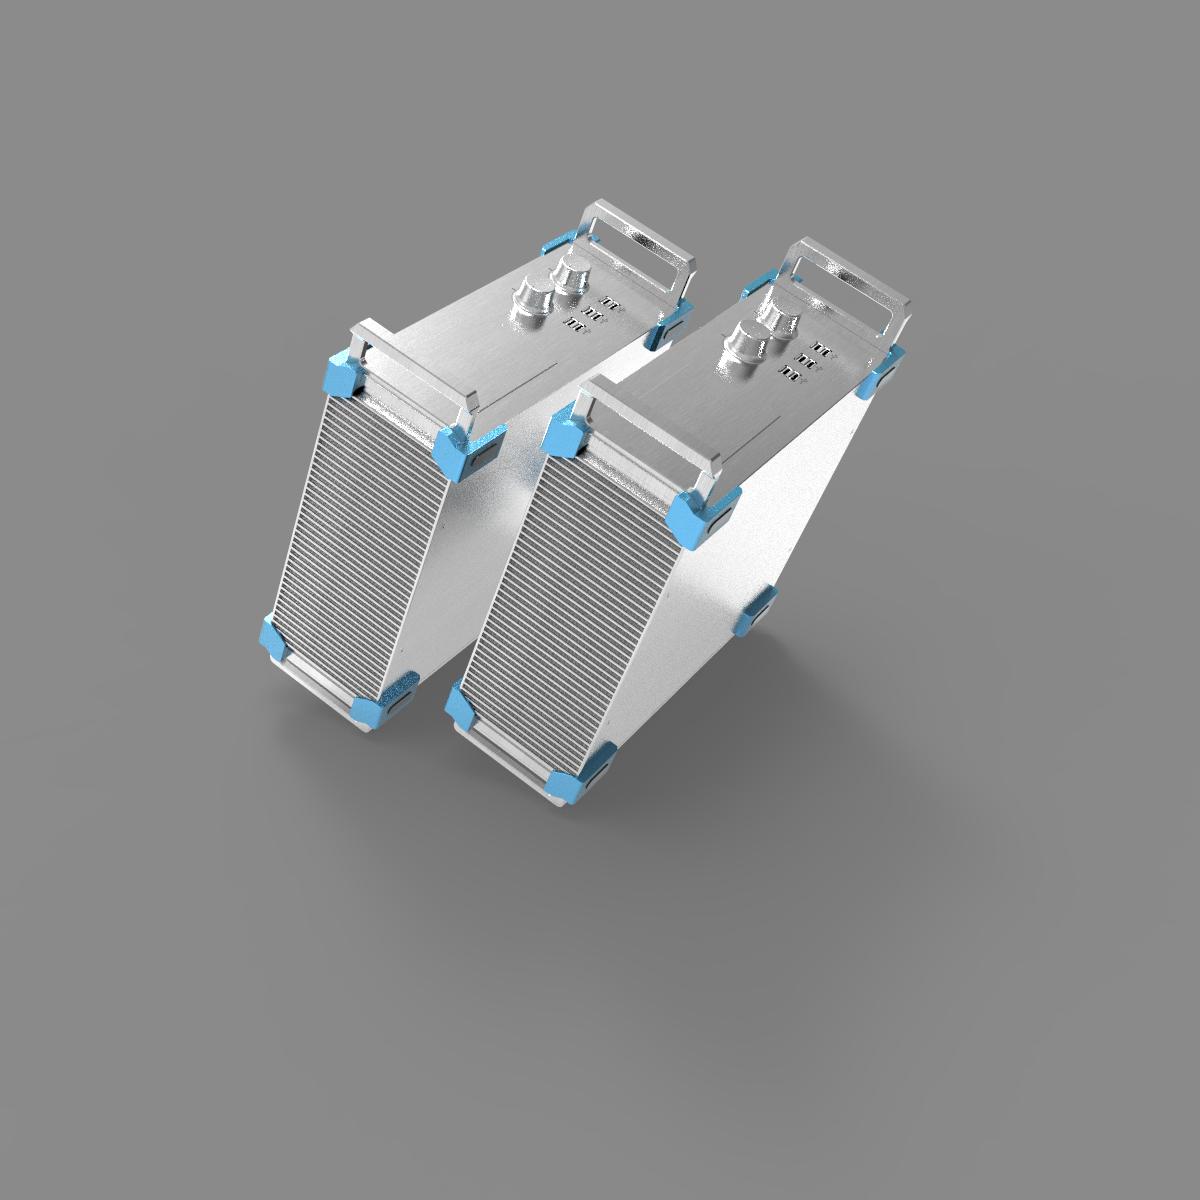 2U الإلكترونية الصناعية الإسكان بالوعة الحرارة الصانع الألومنيوم الإلكترونية Compoent تقاطع رف جبل أداة PCB